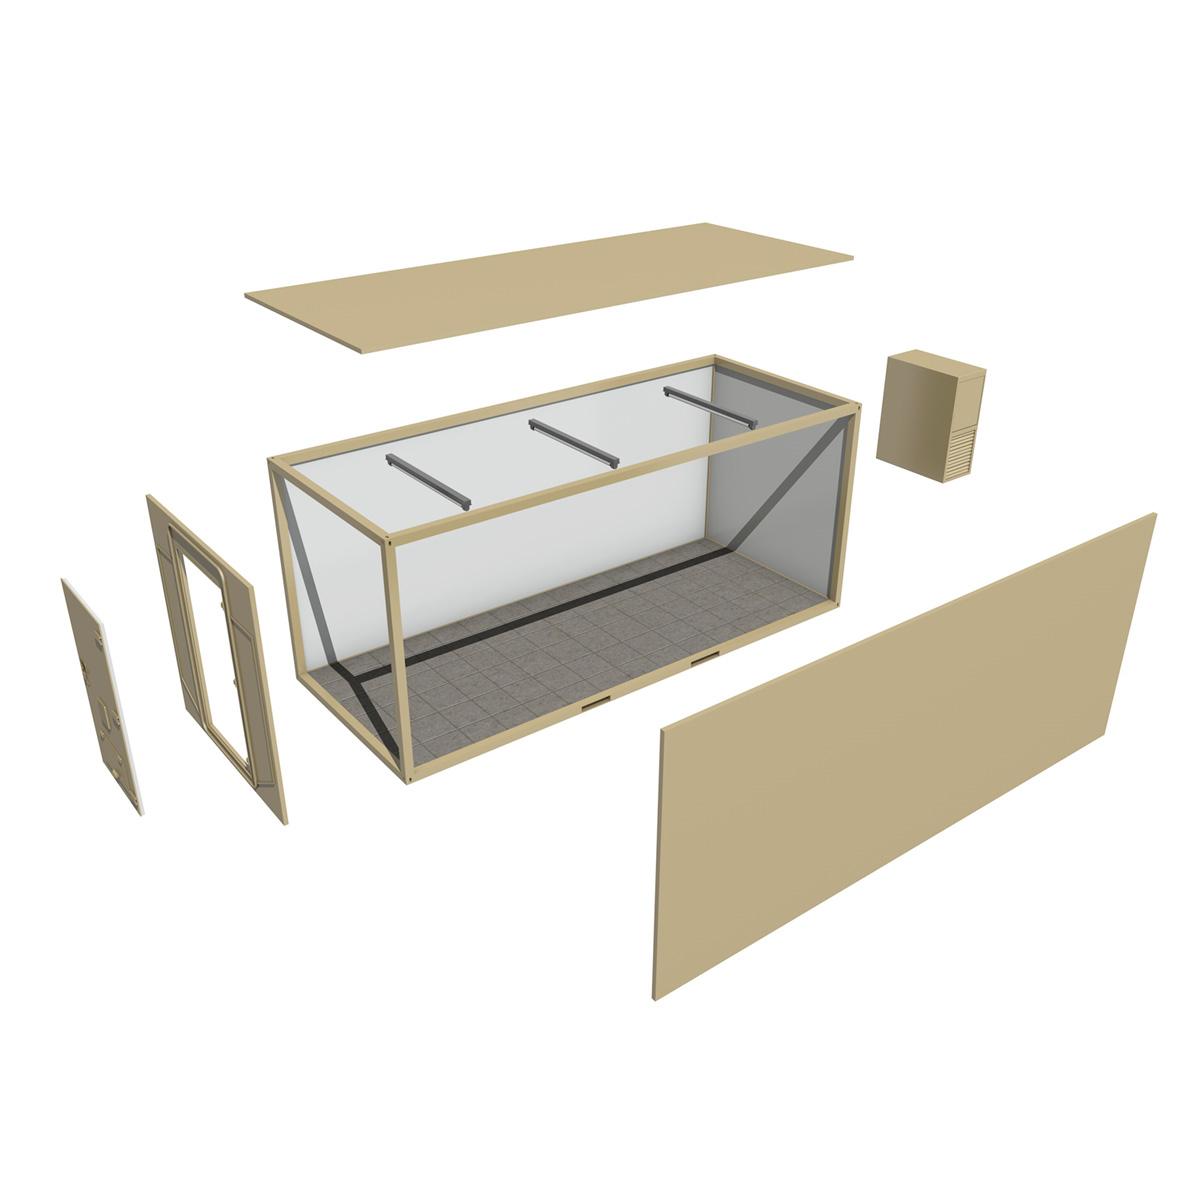 20ft ofis konteyner versiyası iki 3d model 3ds fbx c4d lwo obj 252278